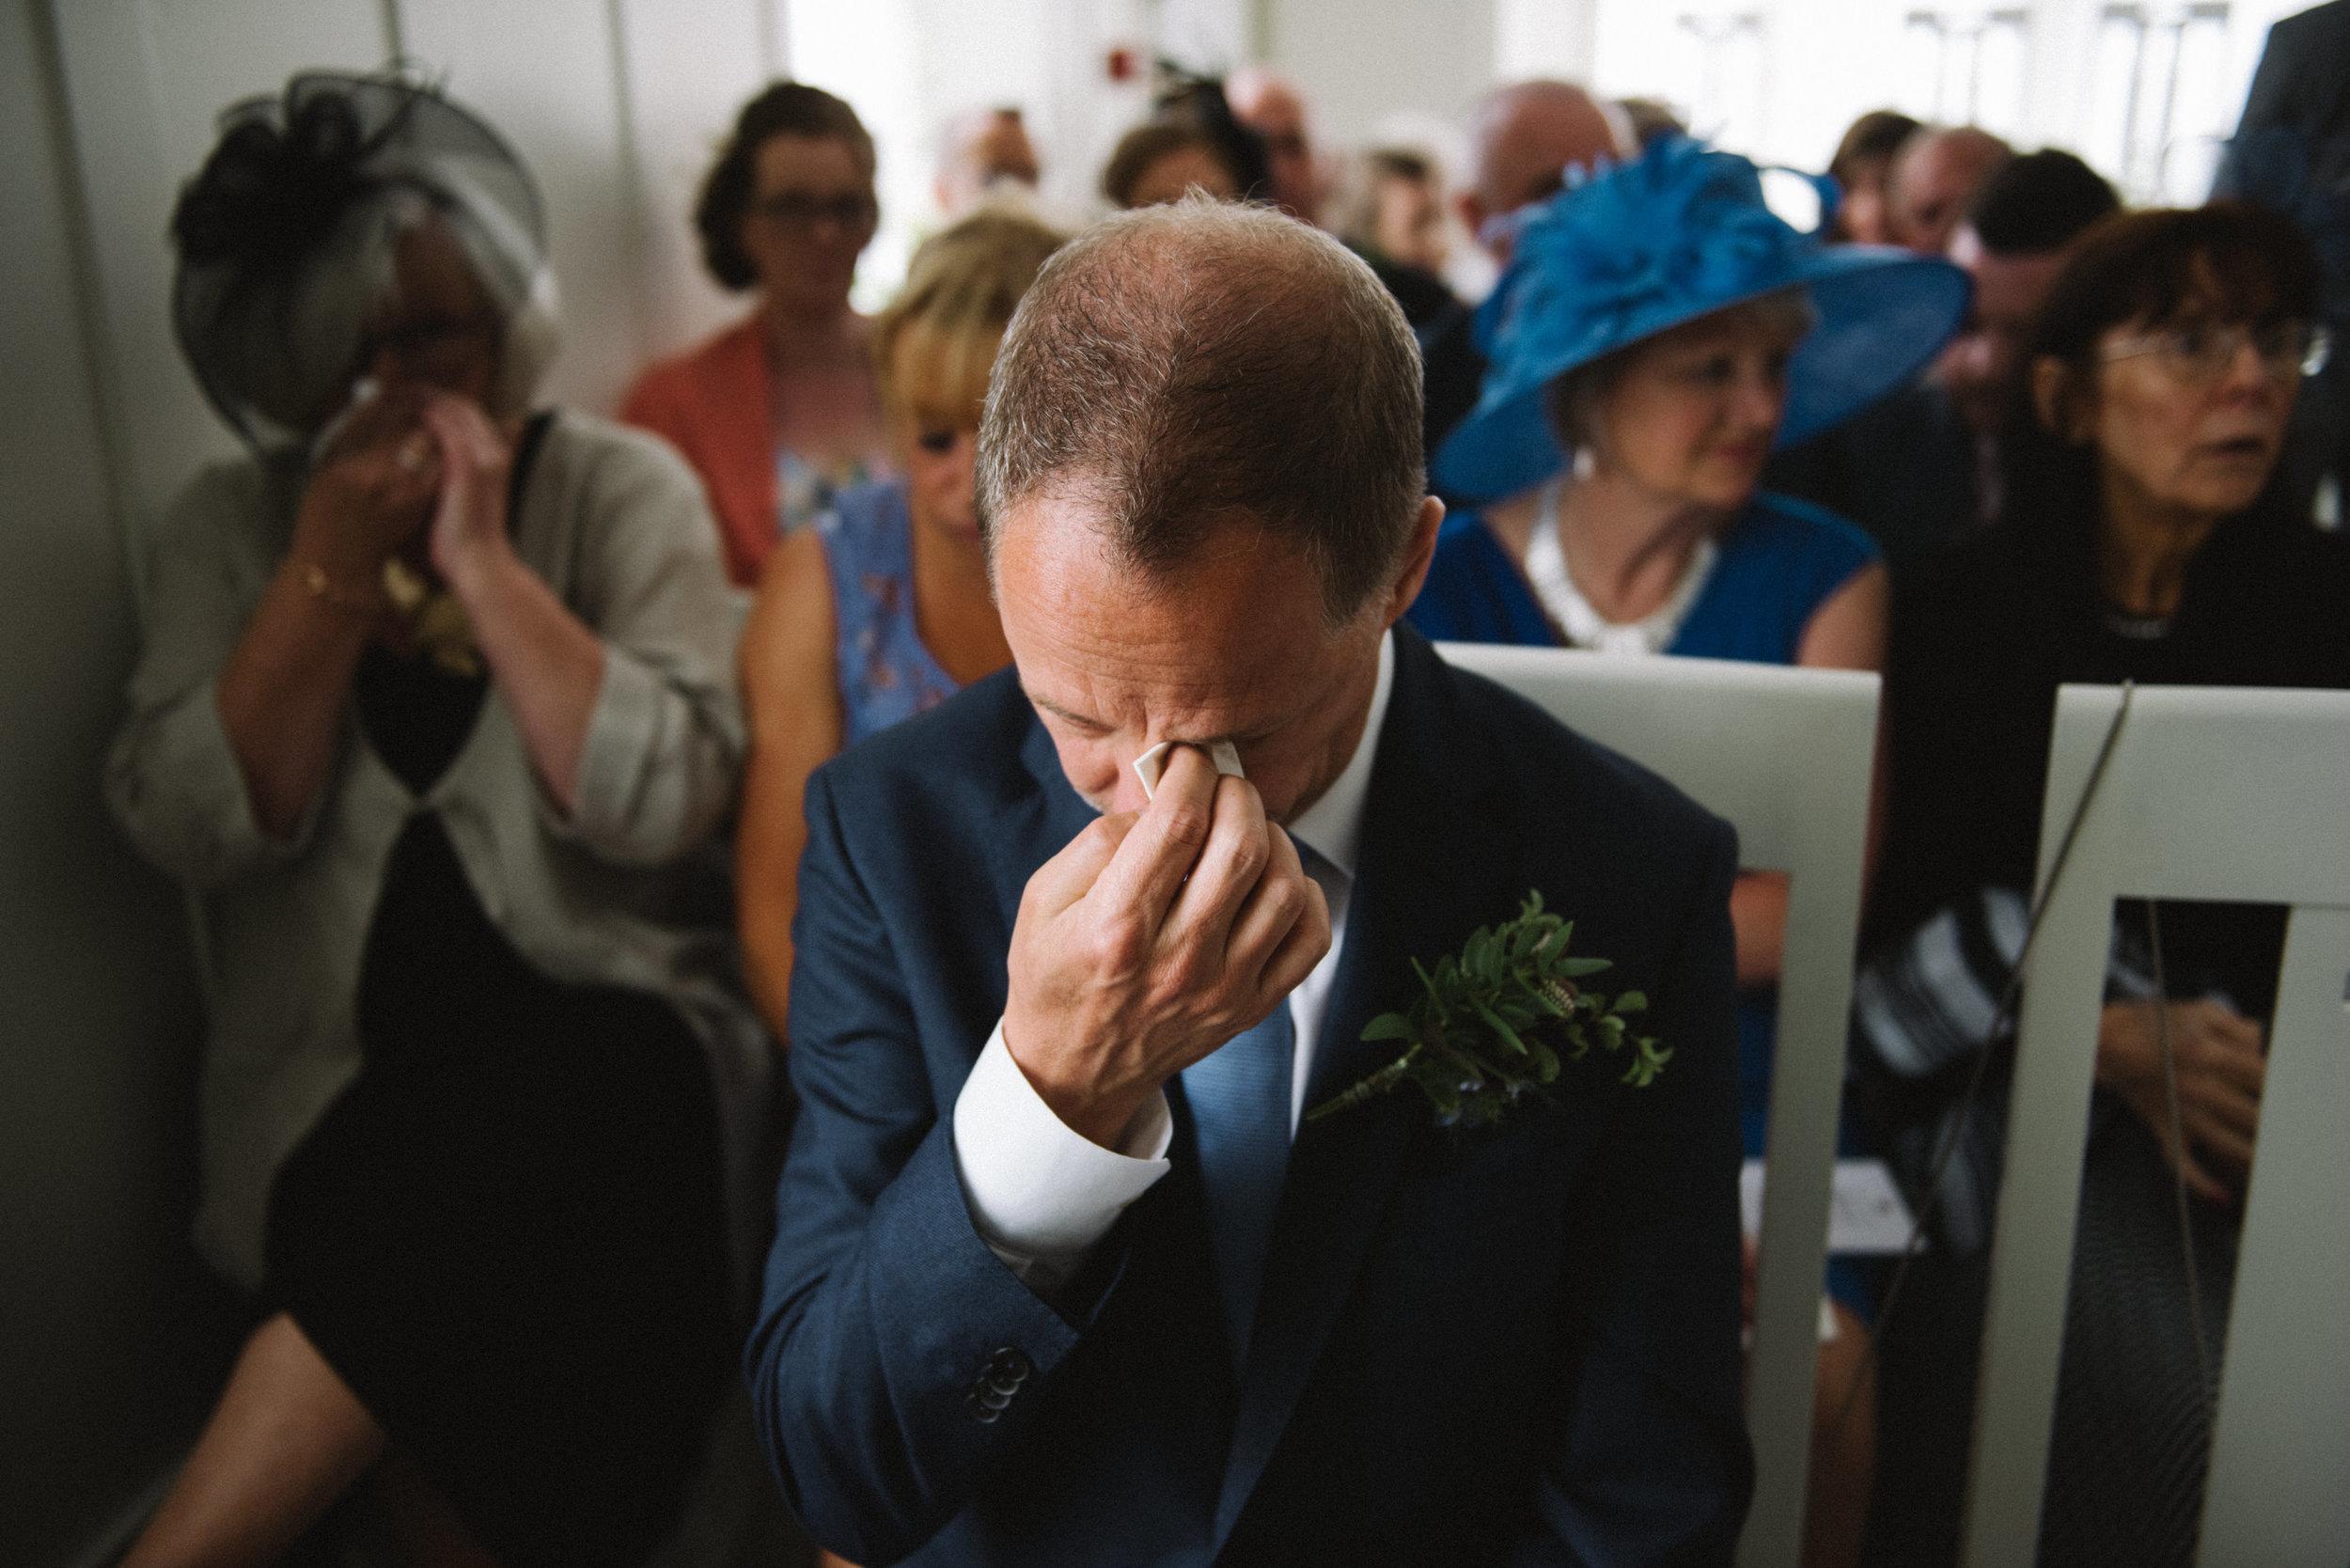 0055-LISA-DEVINE-PHOTOGRAPHY-ALTERNATIVE-WEDDING-PHOTOGRAPHY-SCOTLAND-DESTINATION-WEDDINGS-GLASGOW-WEDDINGS-COOL-WEDDINGS-STYLISH-WEDDINGS.JPG